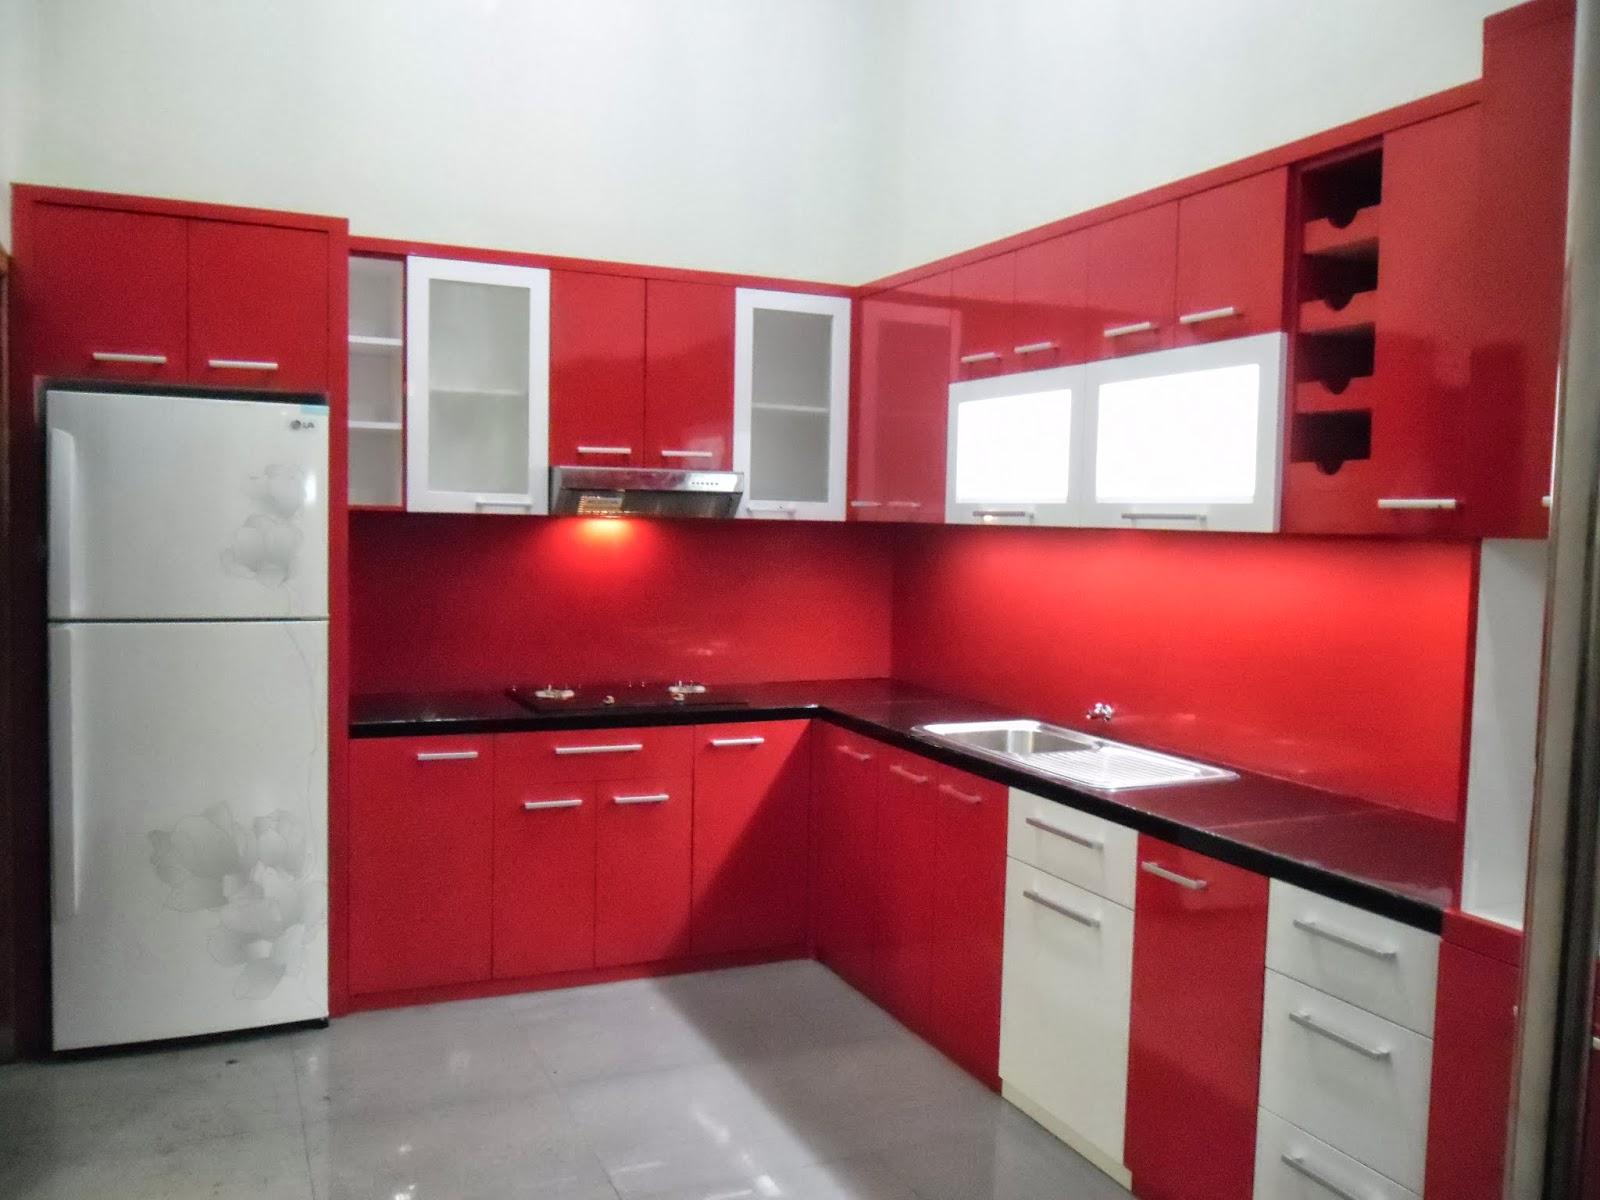 Kitchen Set Minimalis Terbaru 1600x1200 Wallpaper Teahub Io